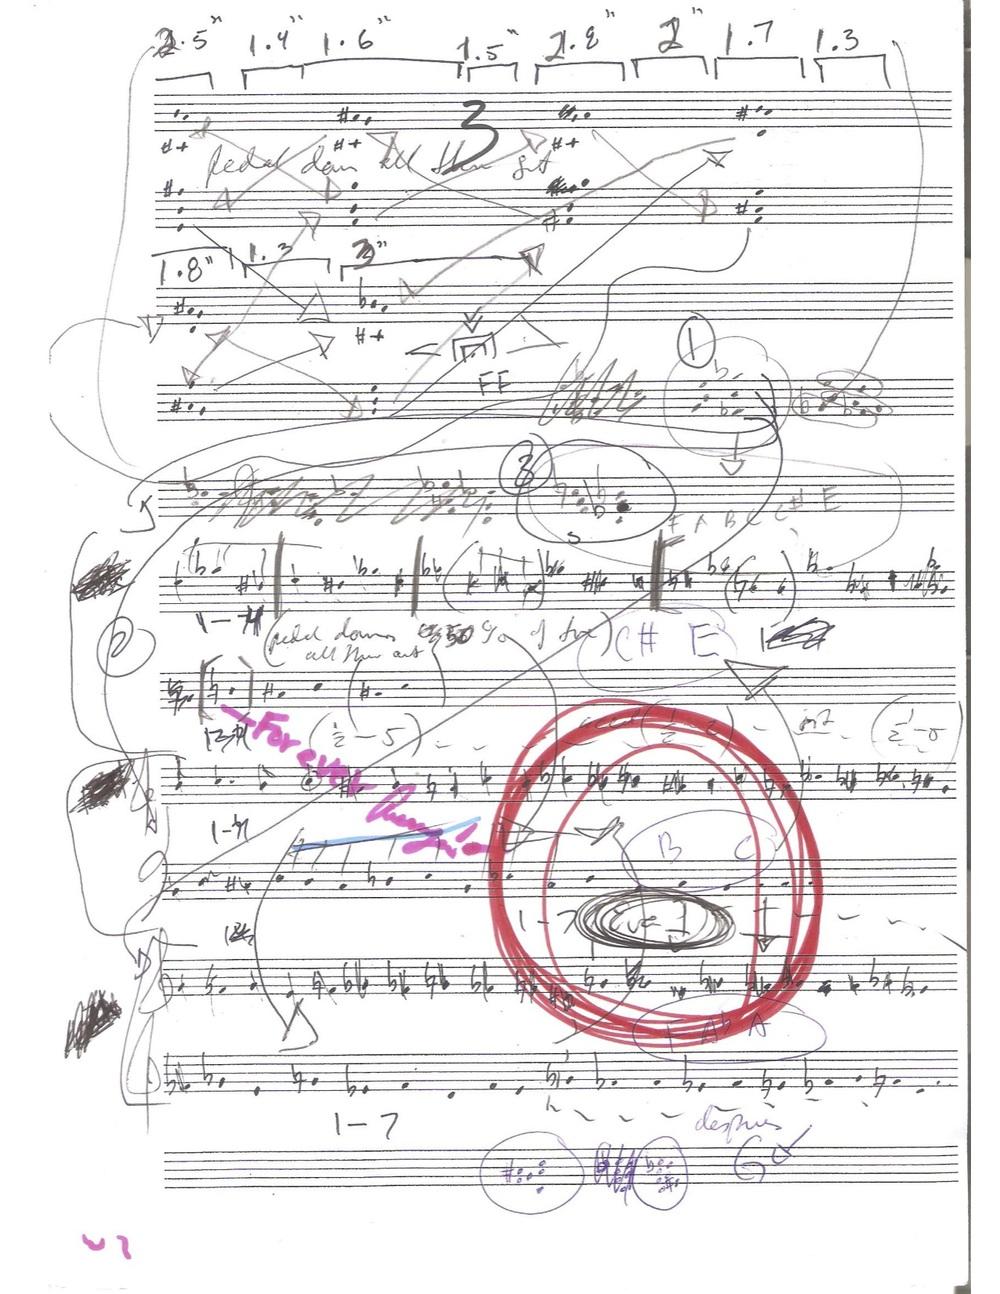 Piano Piece #2rrrrrr.jpg